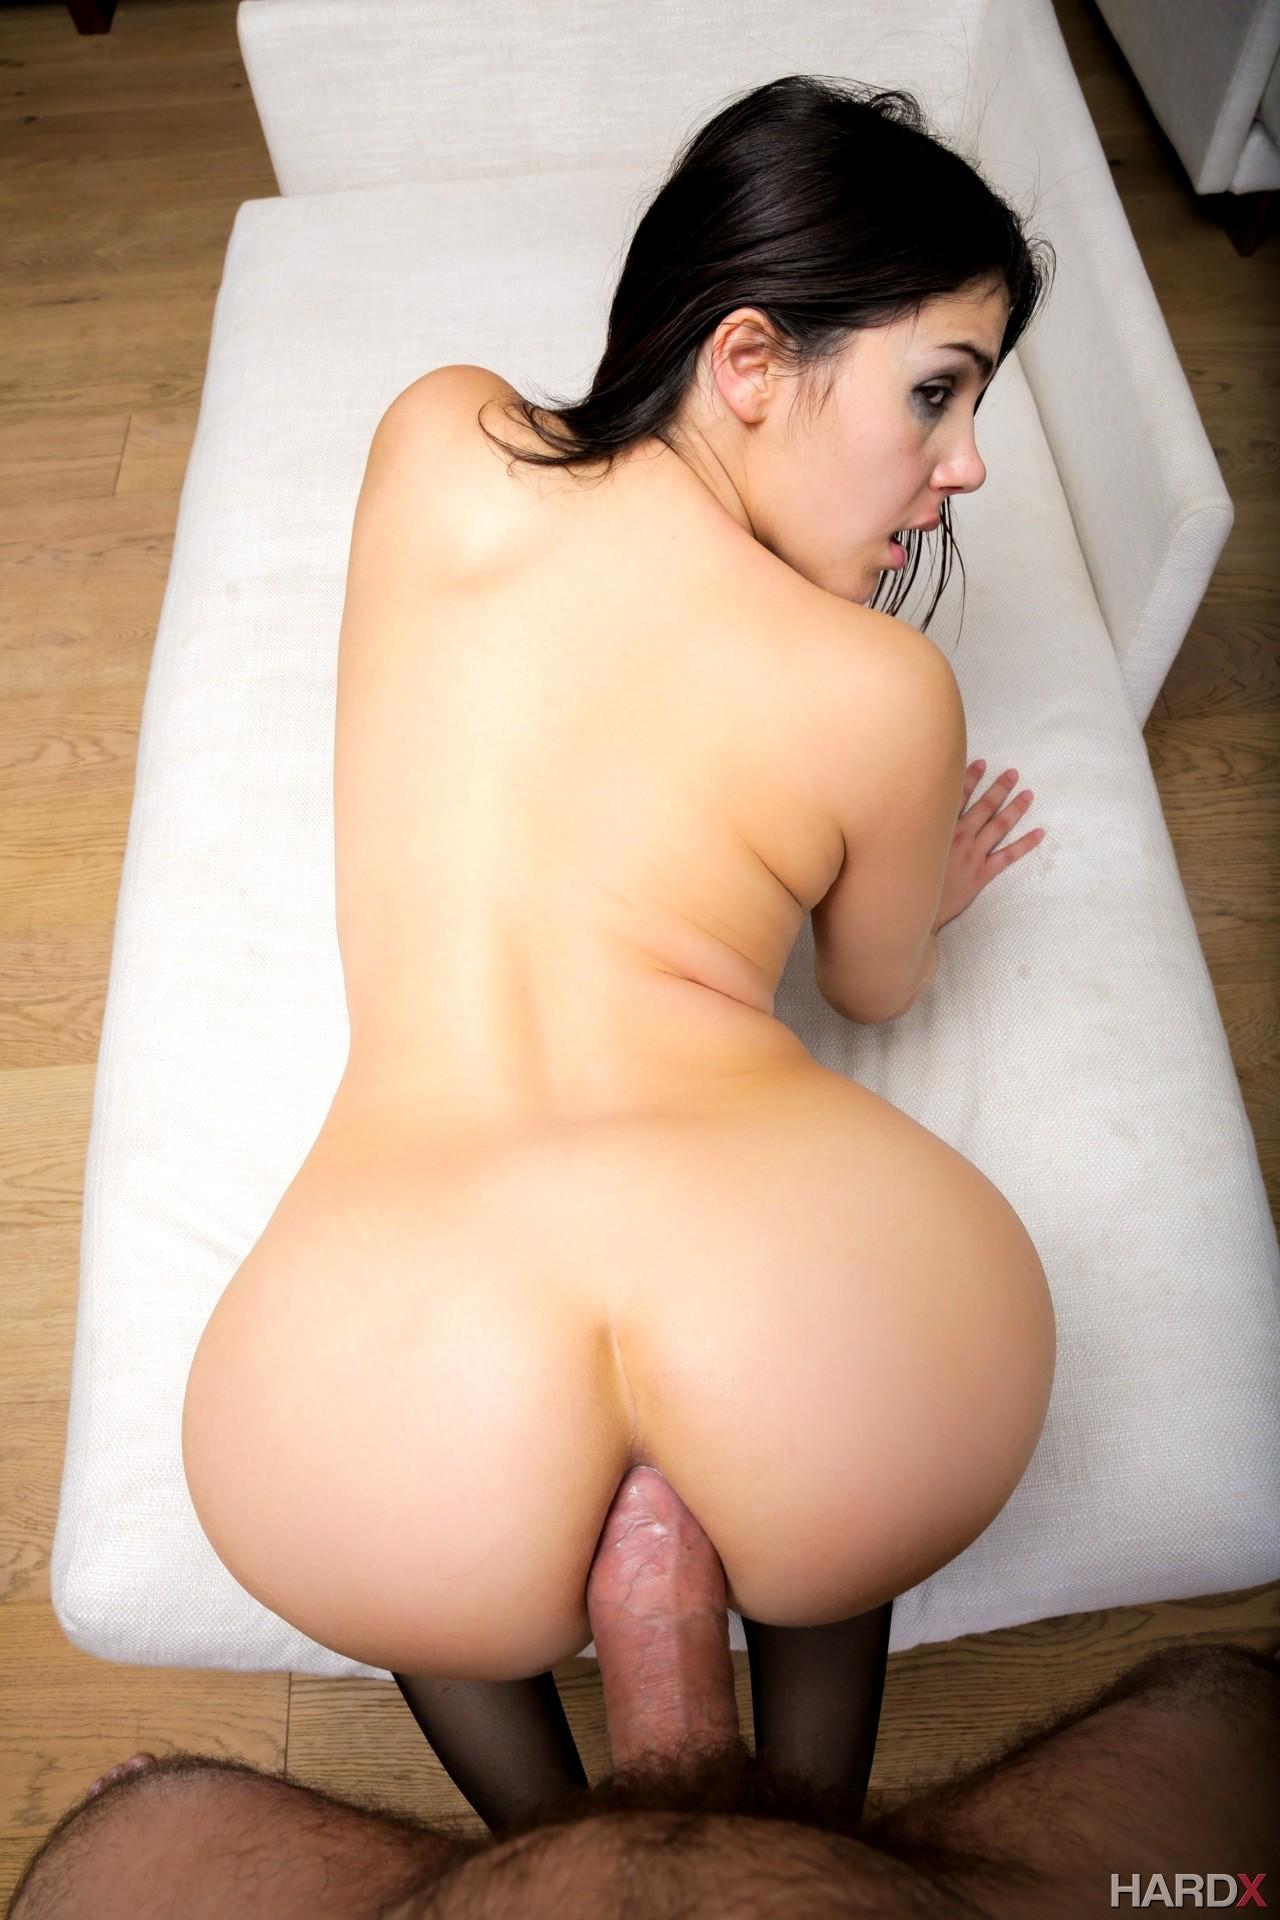 Hot Girl Pov Porn